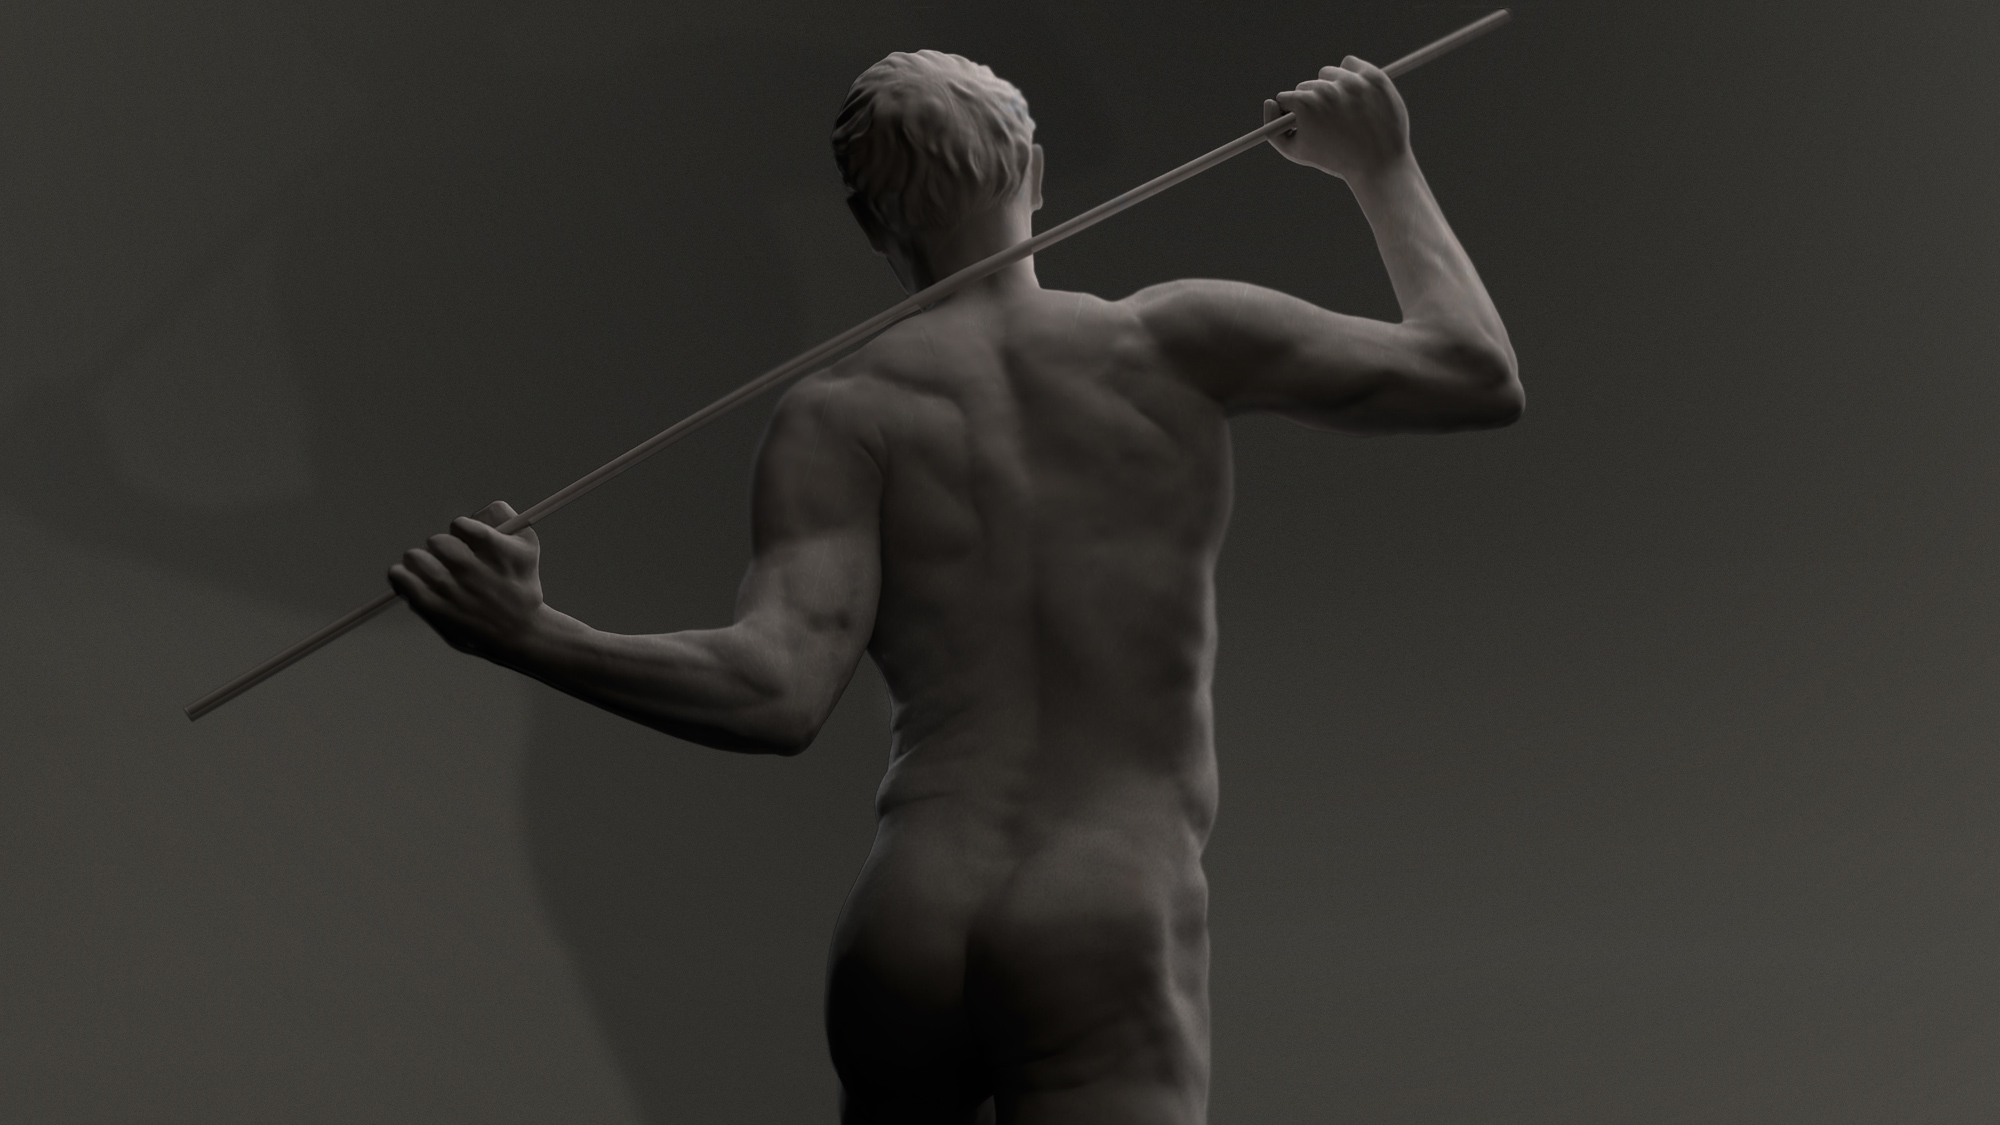 fullSculptBack_01.jpg